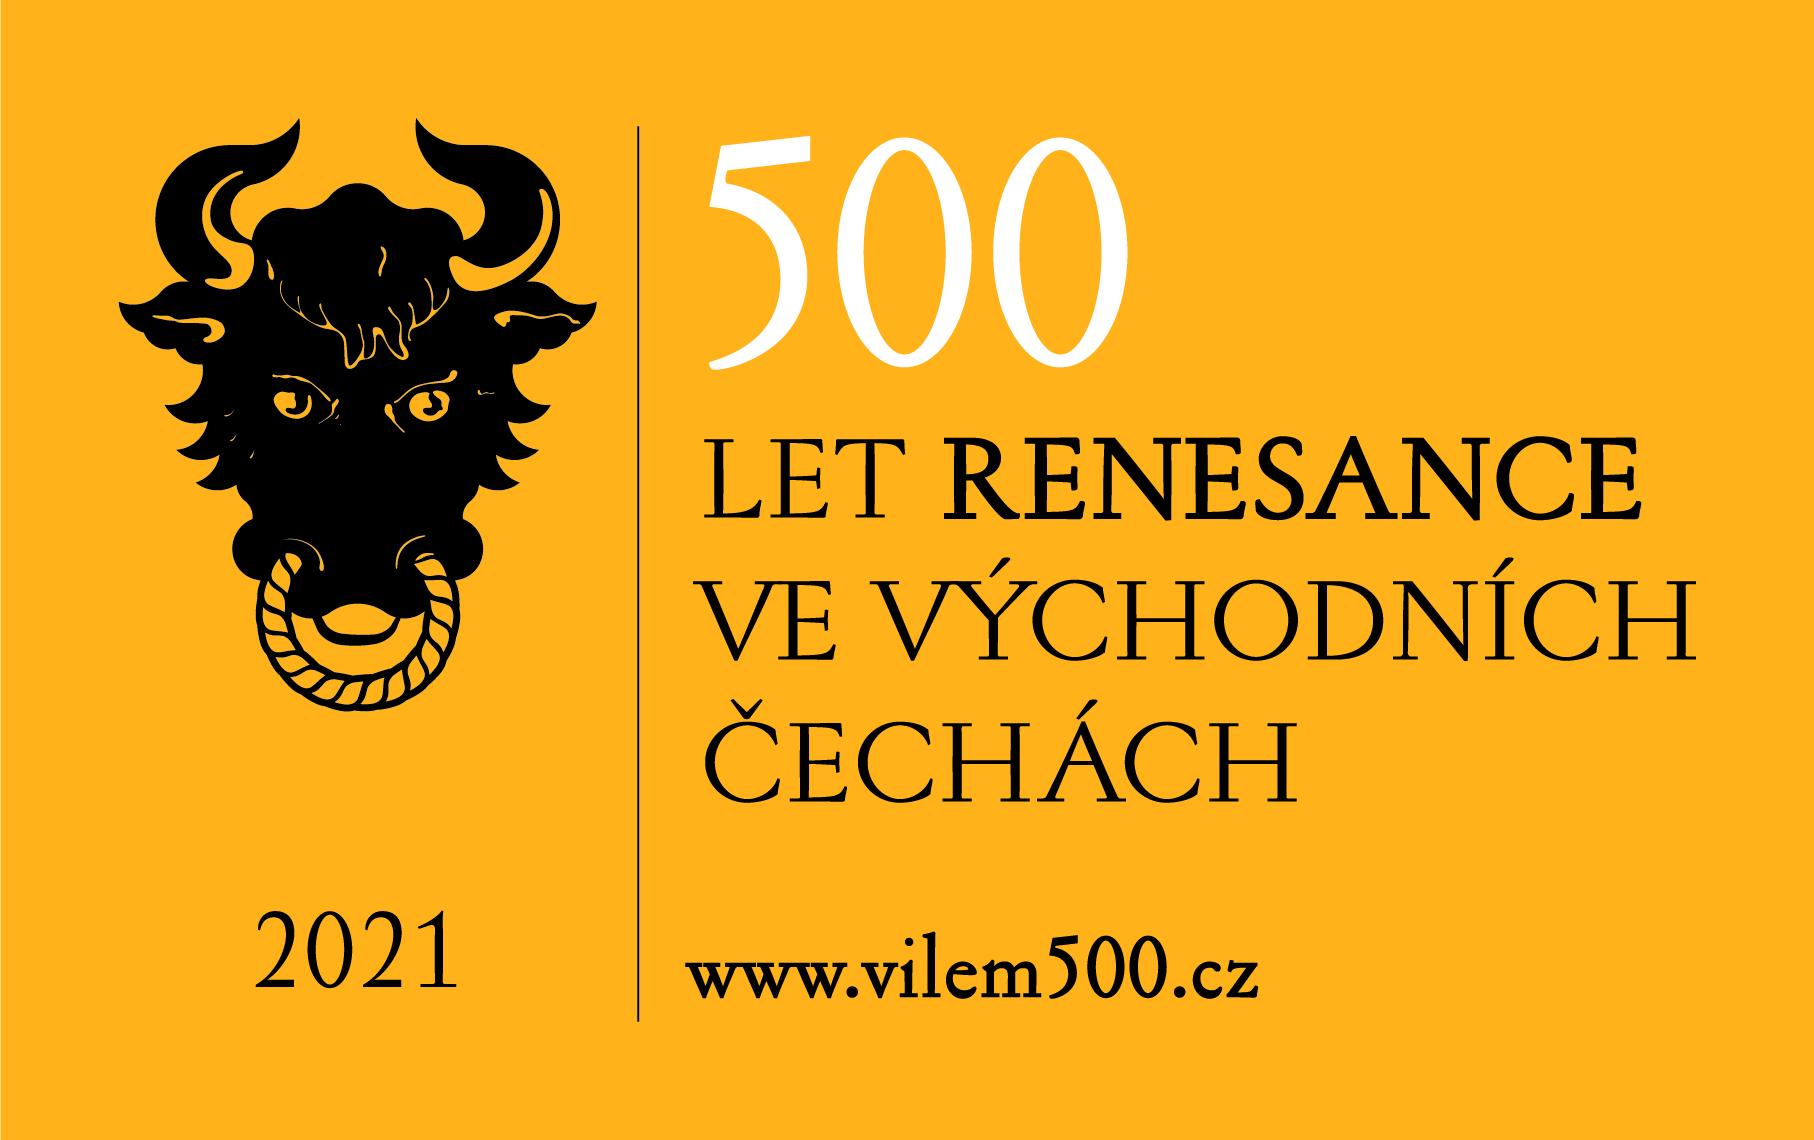 Vilém 500